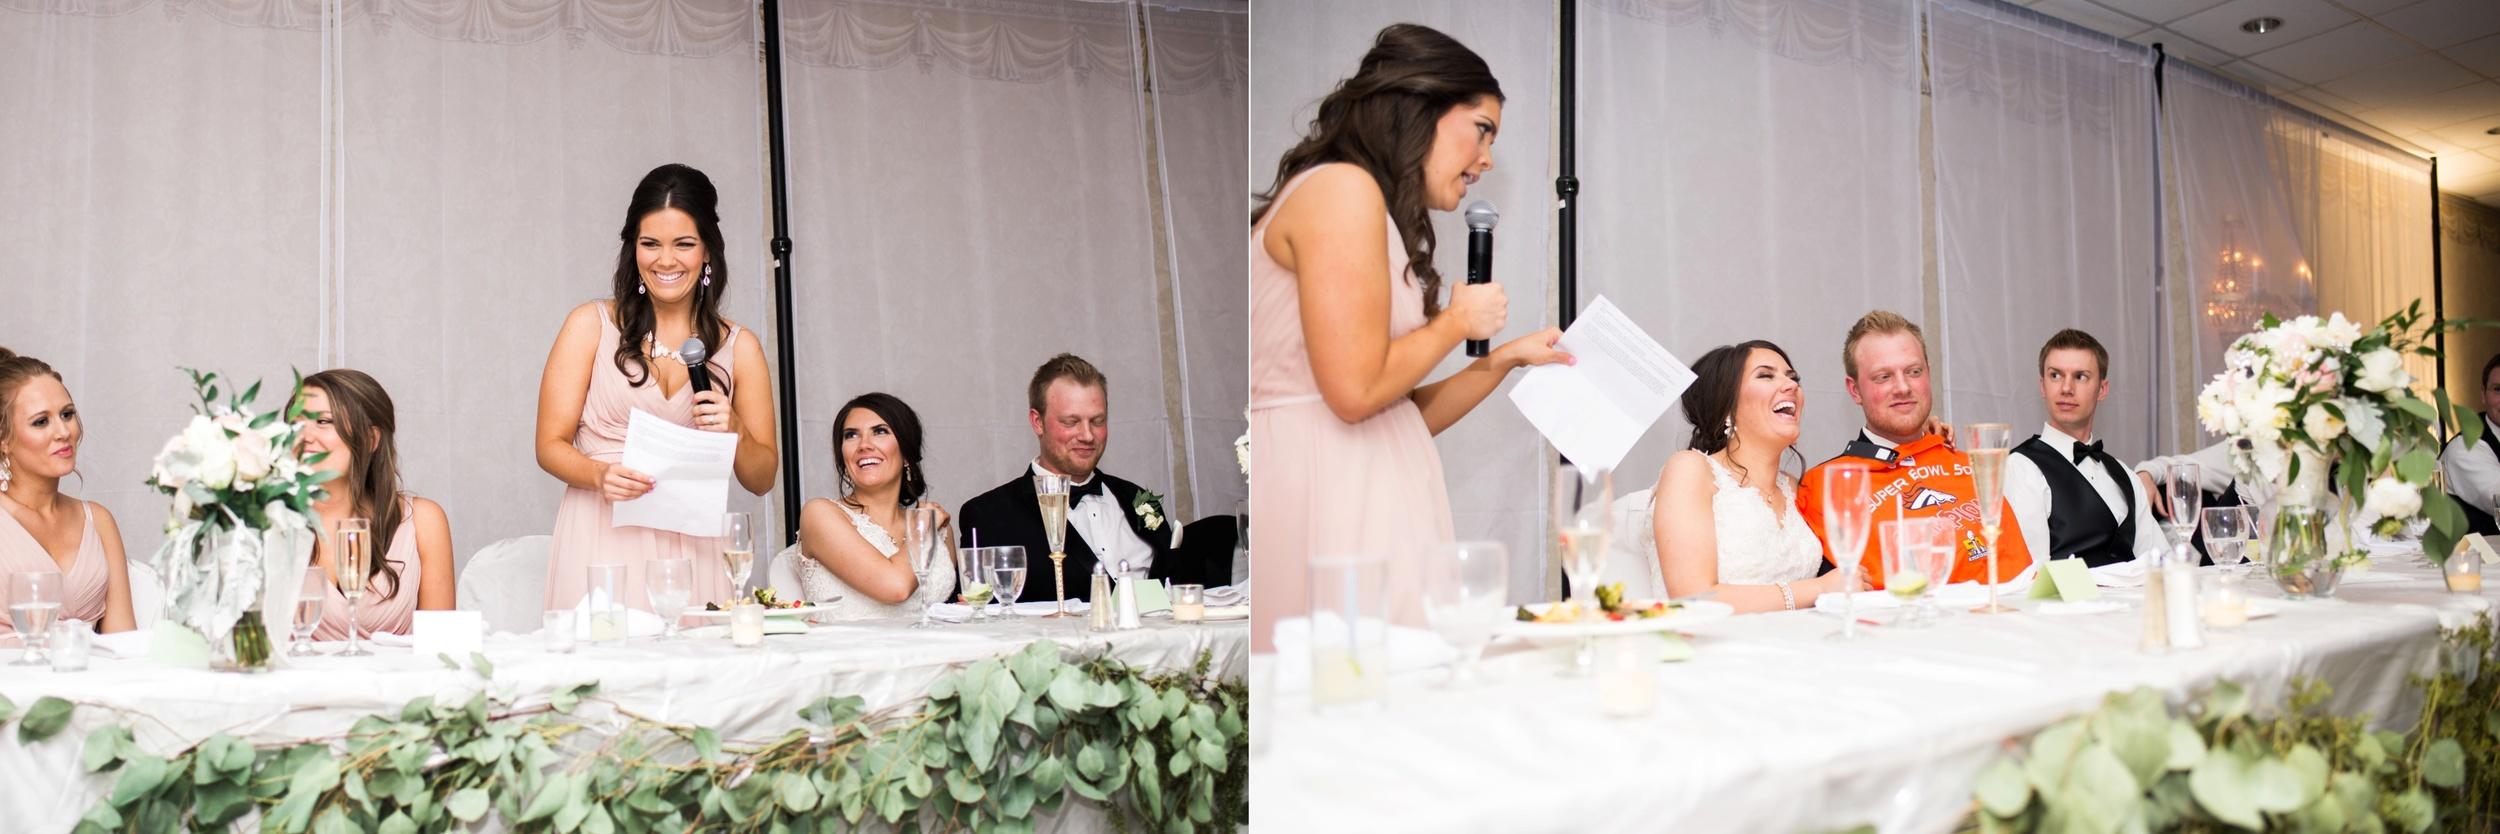 Downtown Des Moines Wedding Photographer_2134.jpg